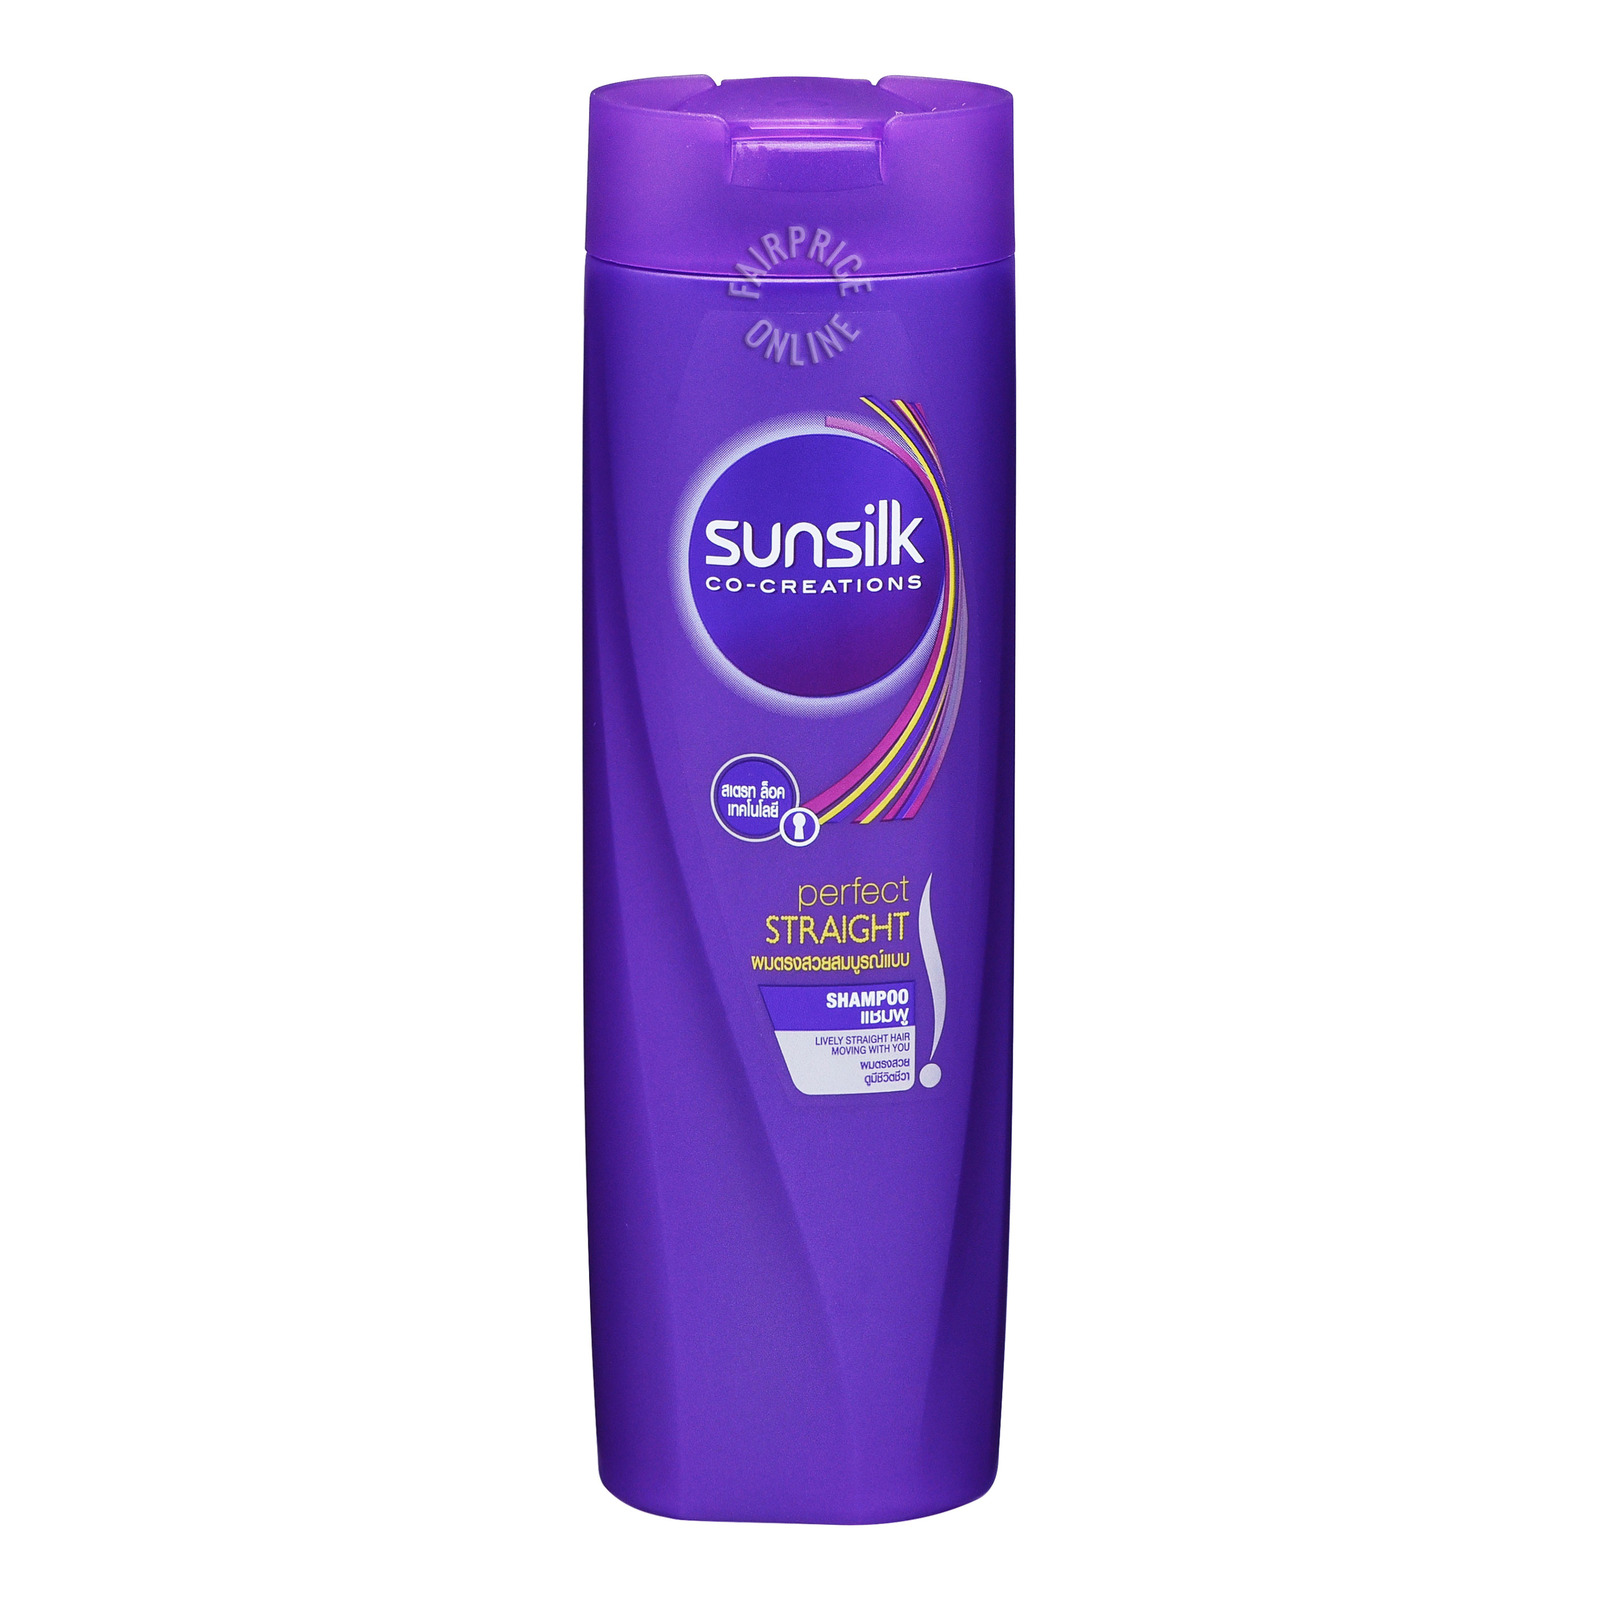 Sunsilk  Perfect Straight  Conditioner, 320mL